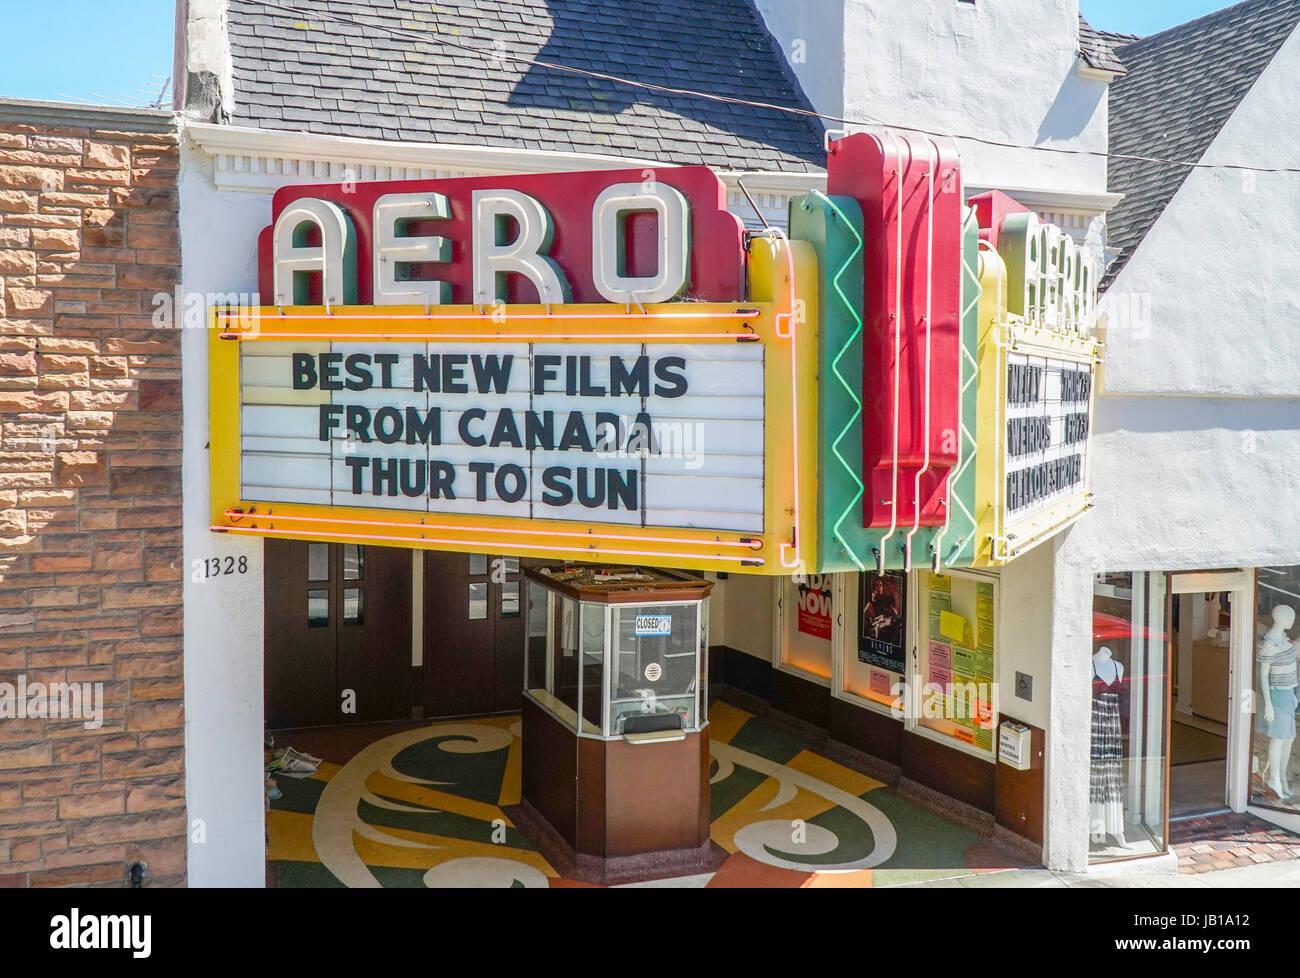 Small Movie Theater In Santa Monica The Aero Cinema Los Angeles Stock Photo Alamy